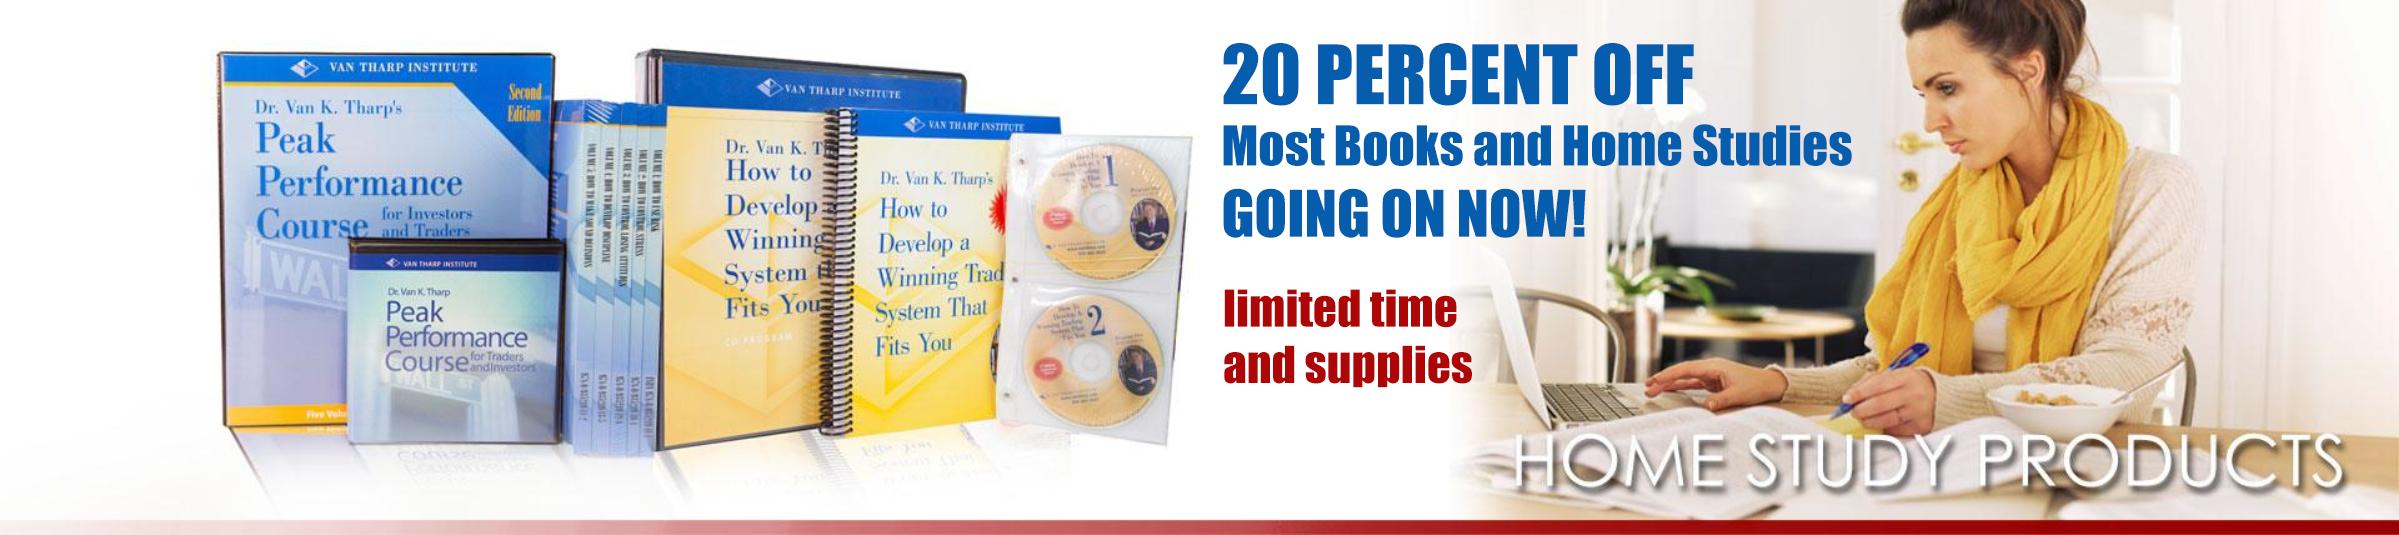 Books & Home Study